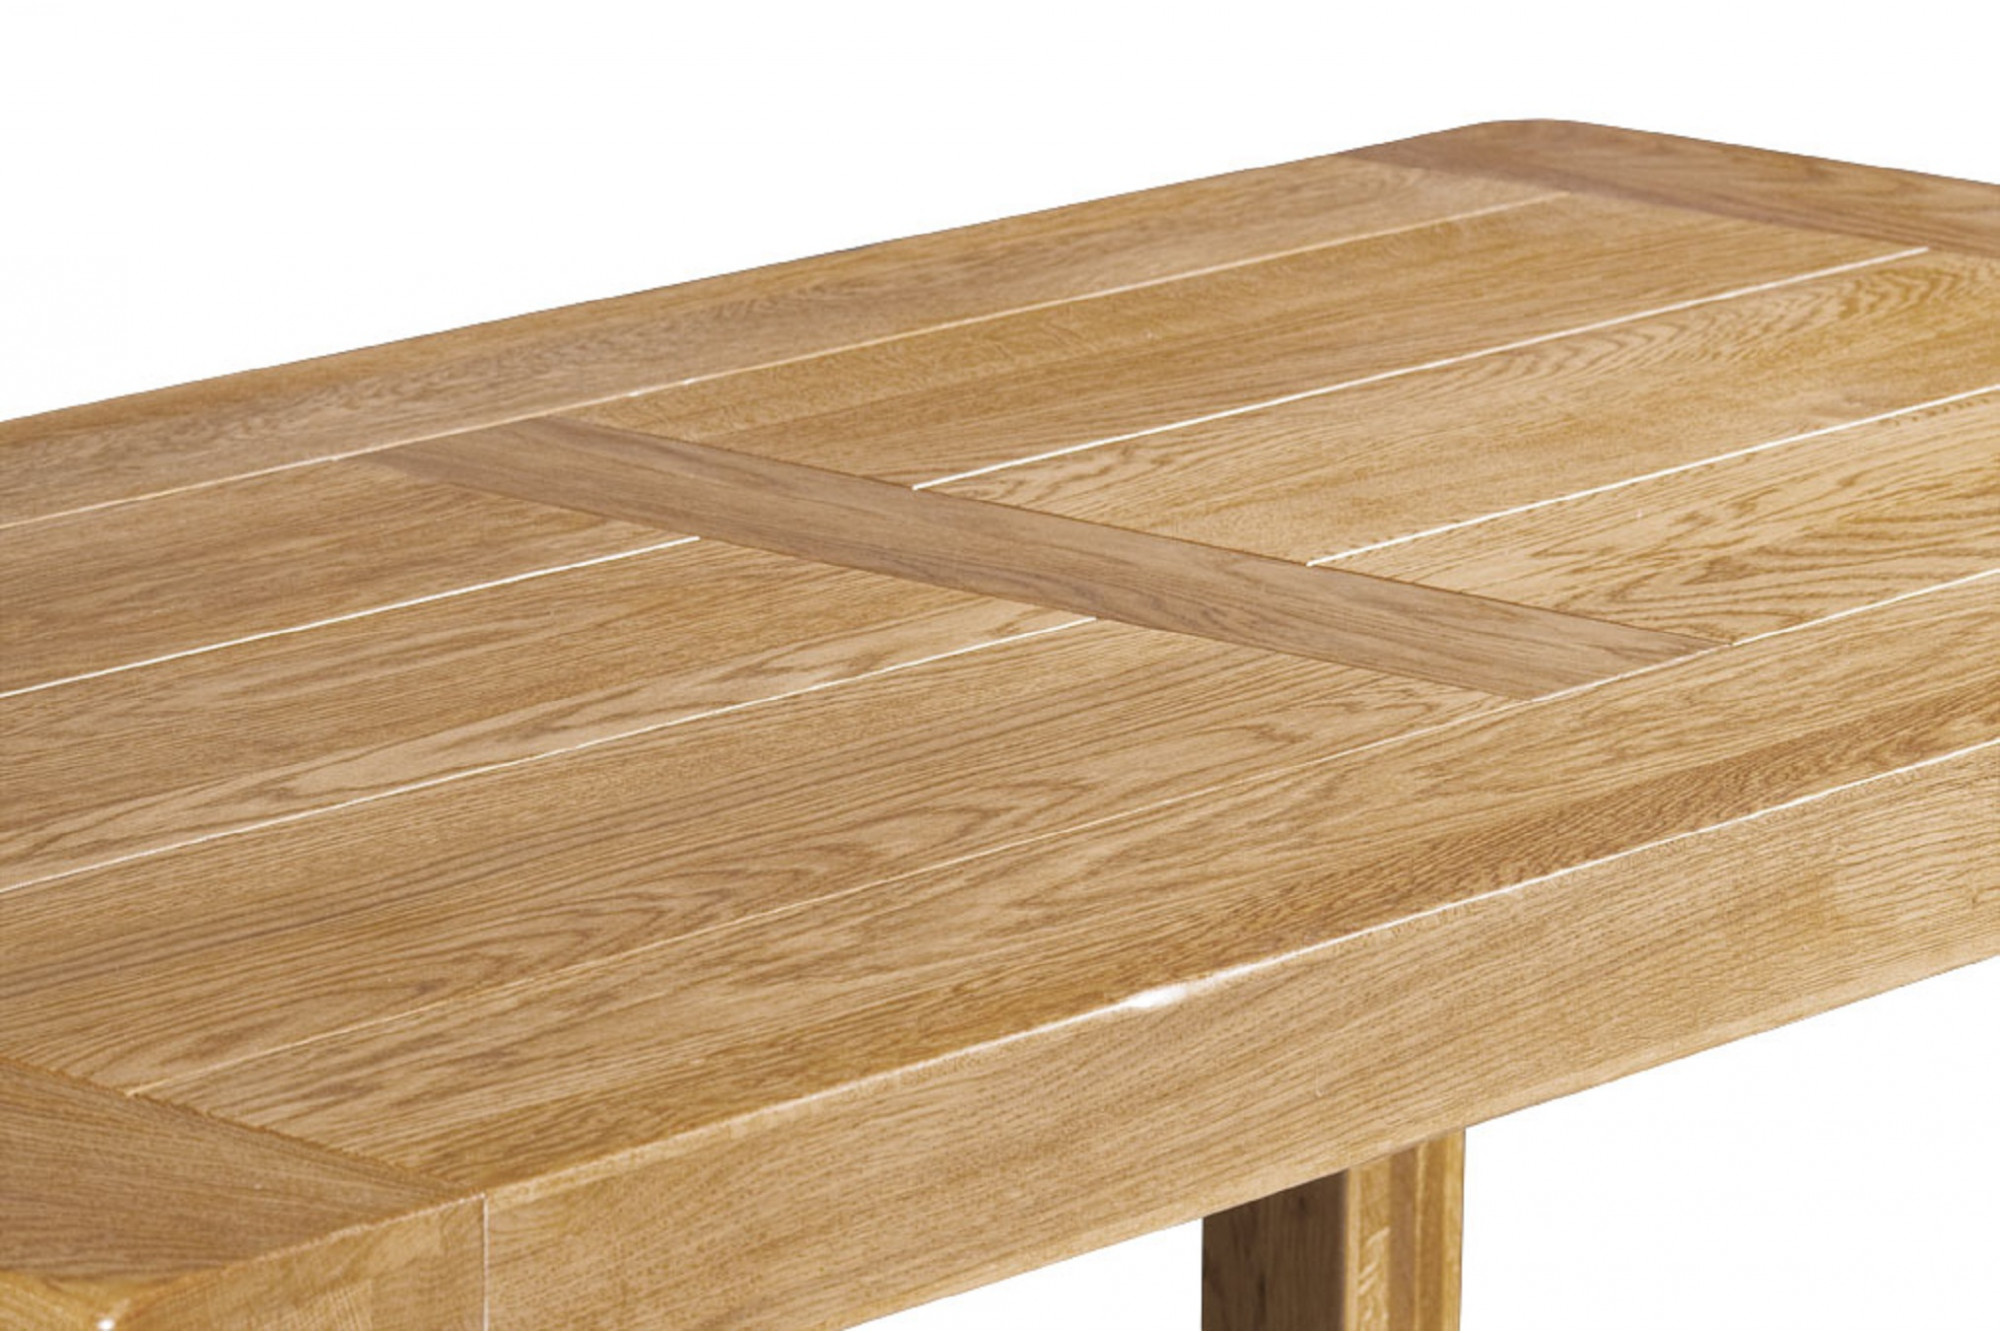 Table de ferme campagnarde   bois chêne massif L12